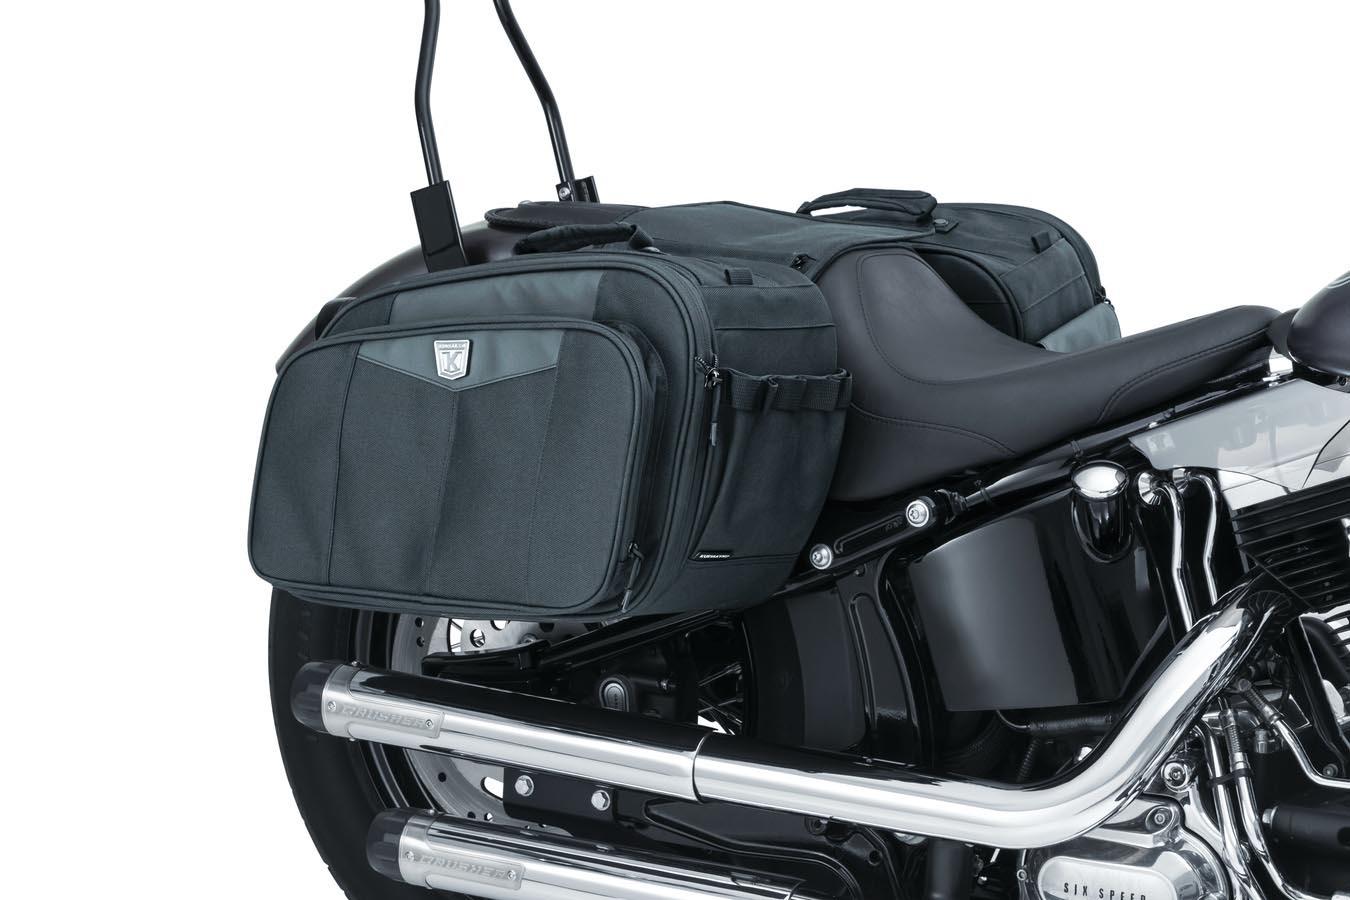 Kuryakyn Momentum Luggage Outrider